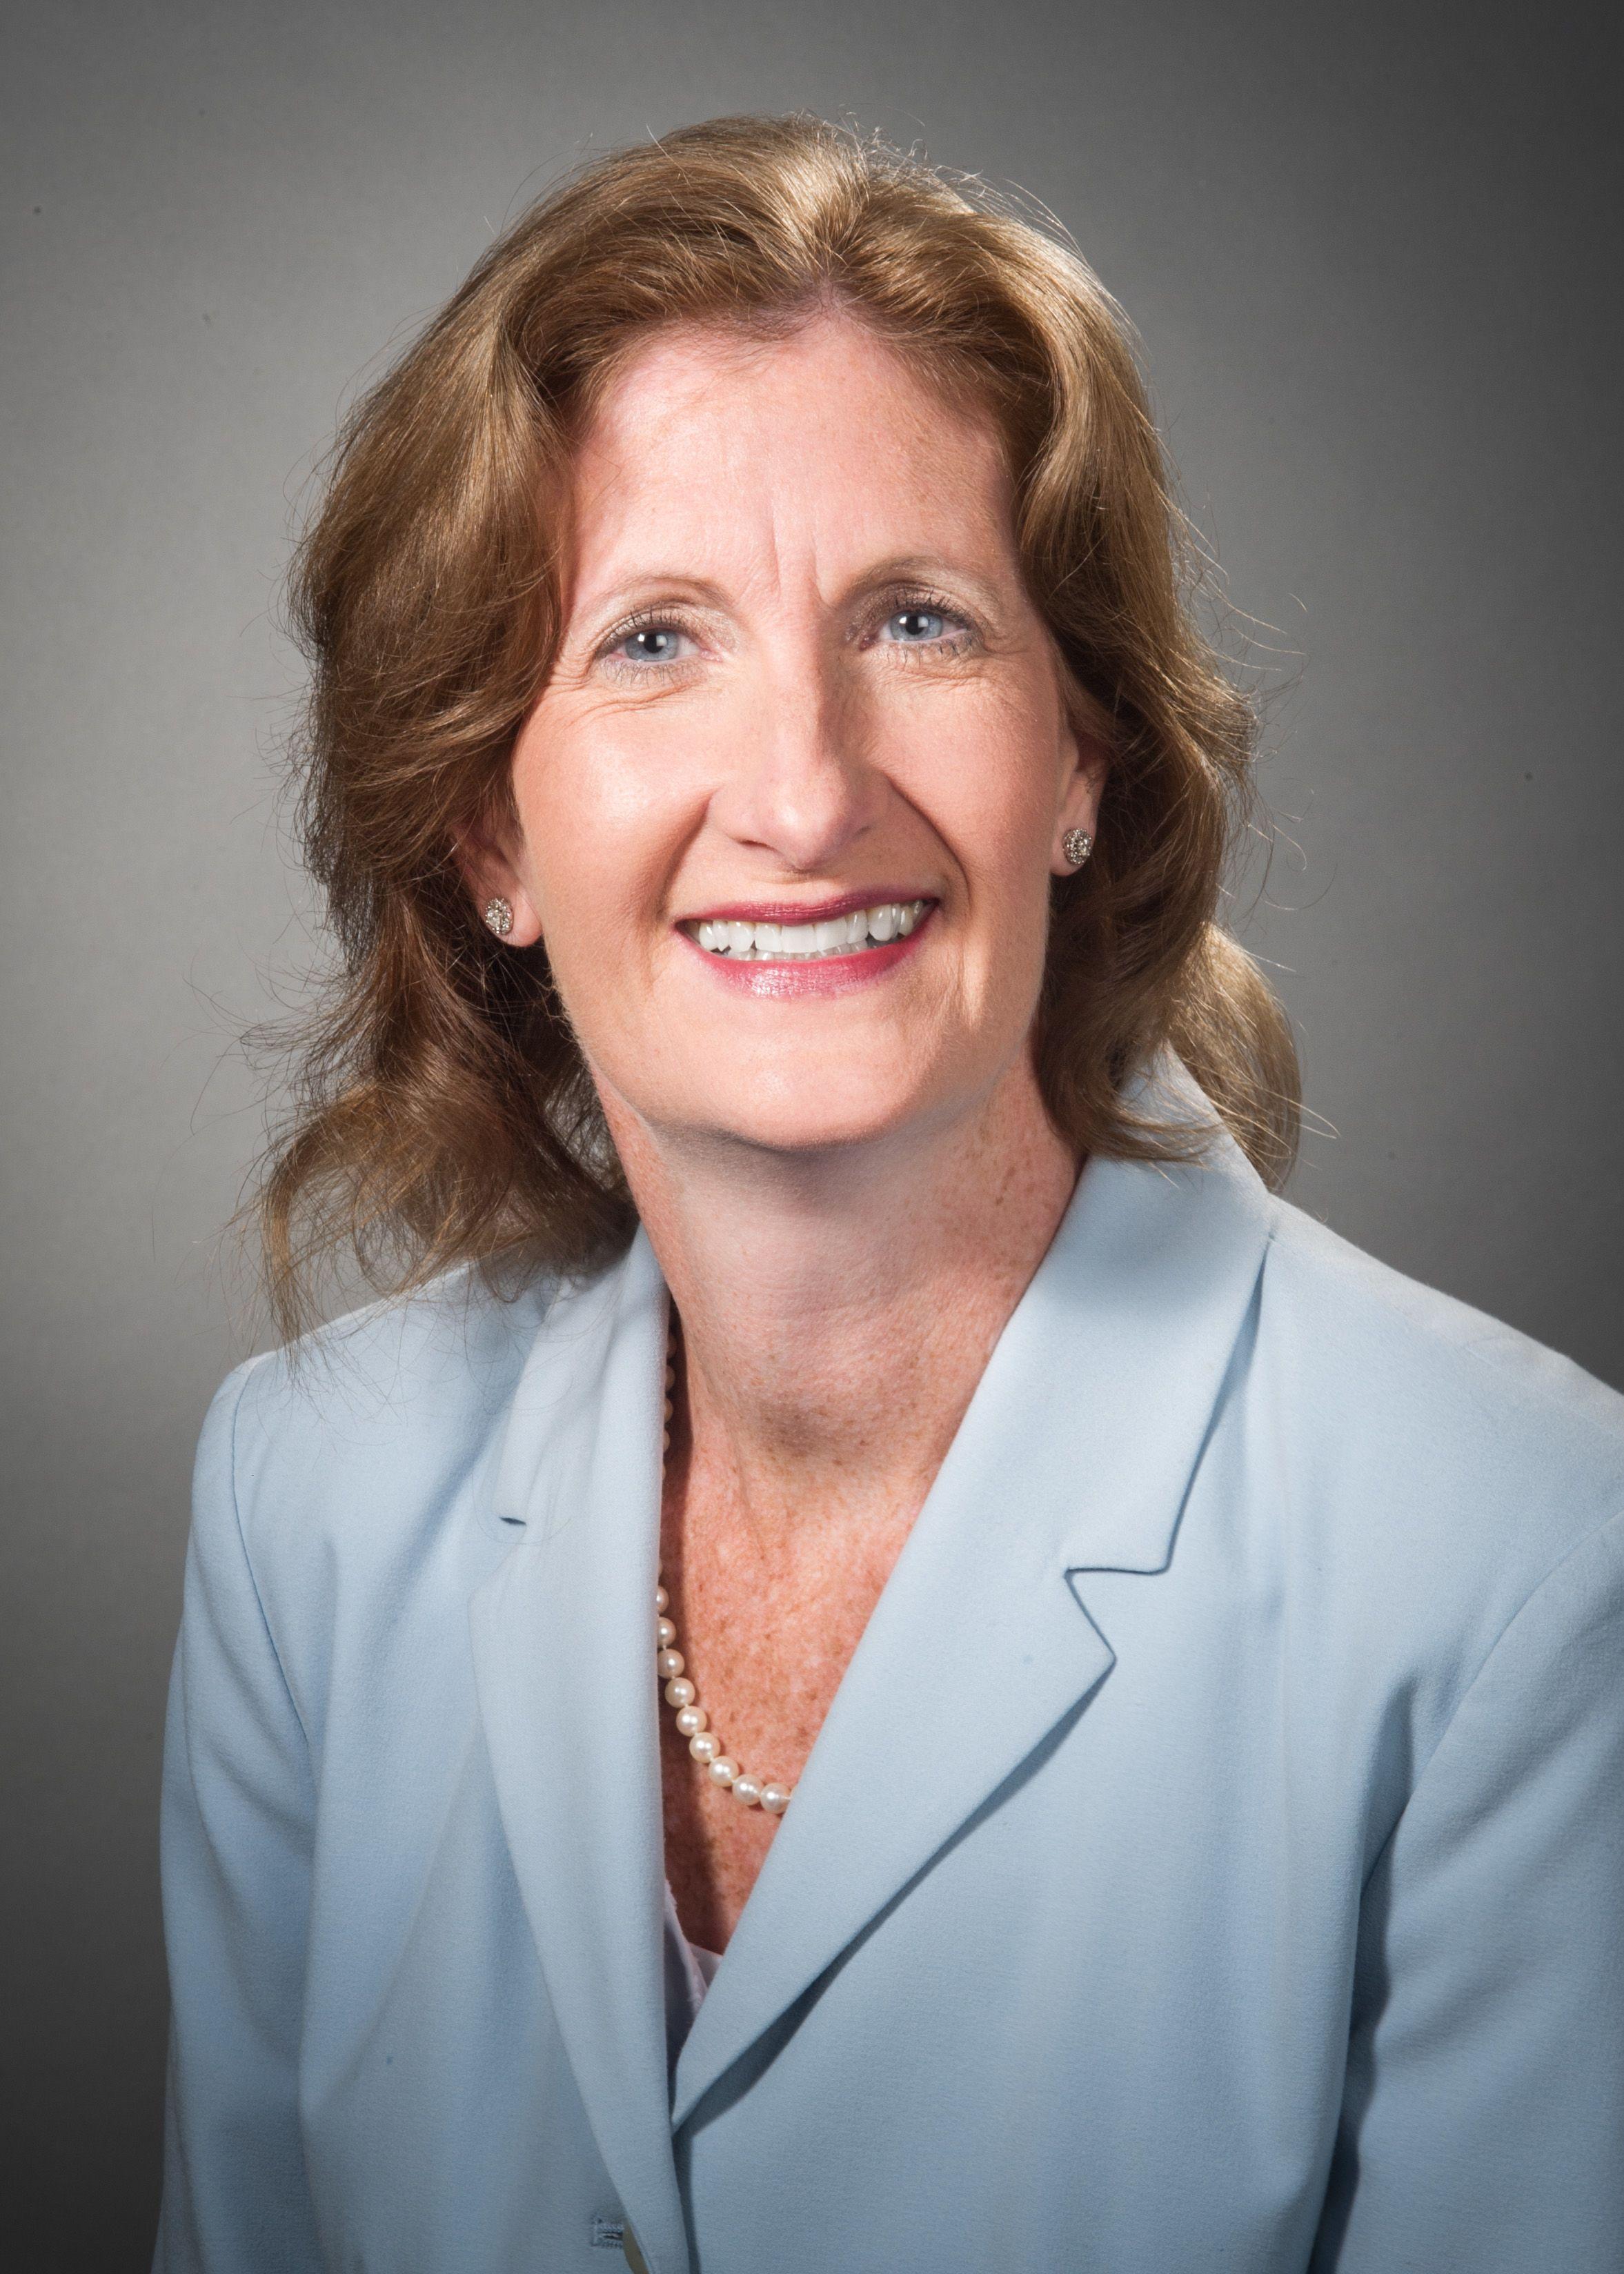 Debbie J. Ekstrom, NP